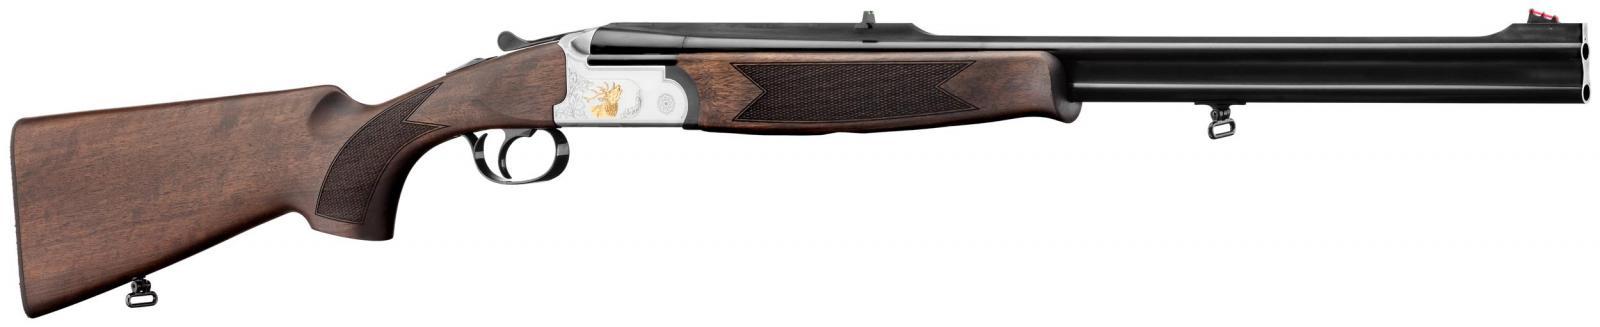 Carabine RENATO BALDI EXPRESS PREMIER Ergal Cal. 8x57JRS